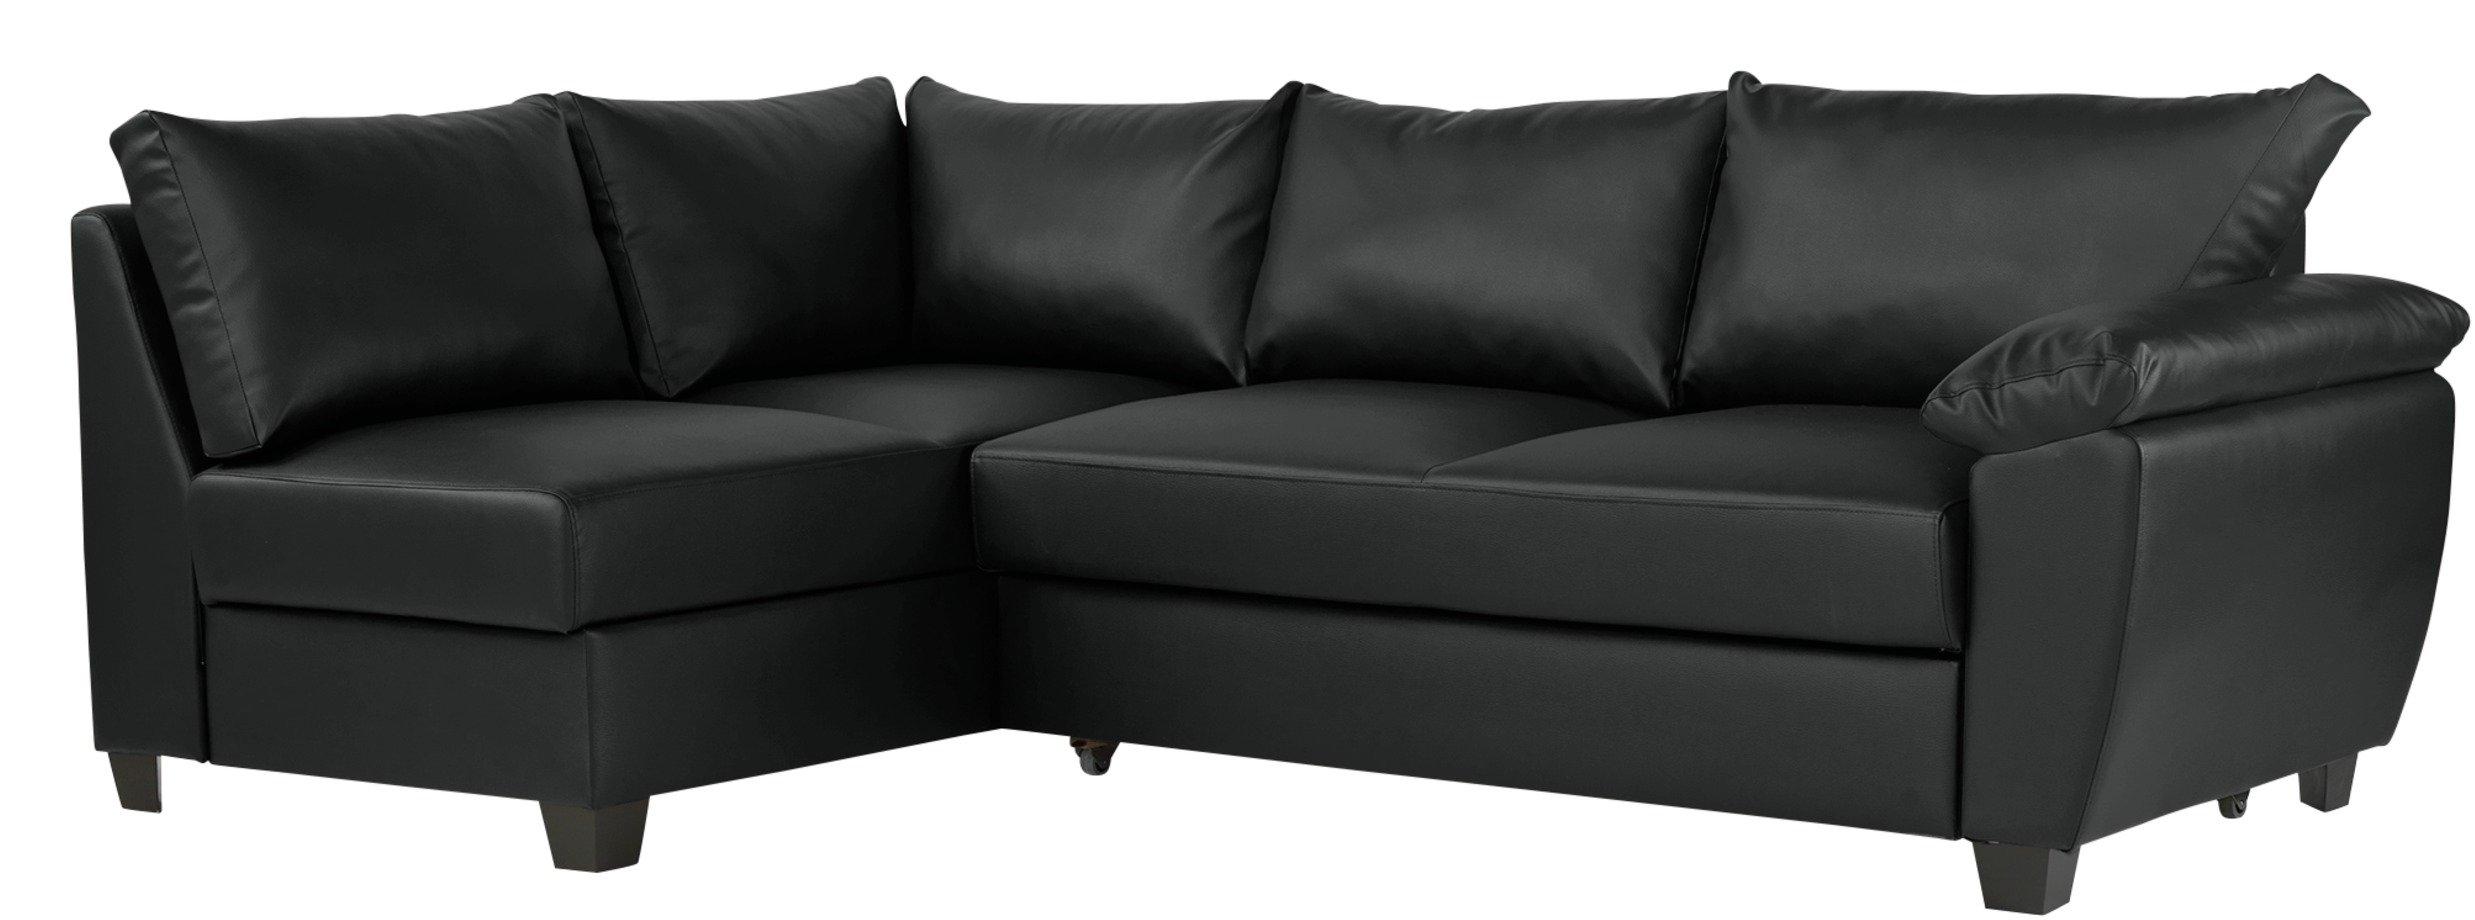 Argos Home Fernando Left Corner Sofa Bed - Black